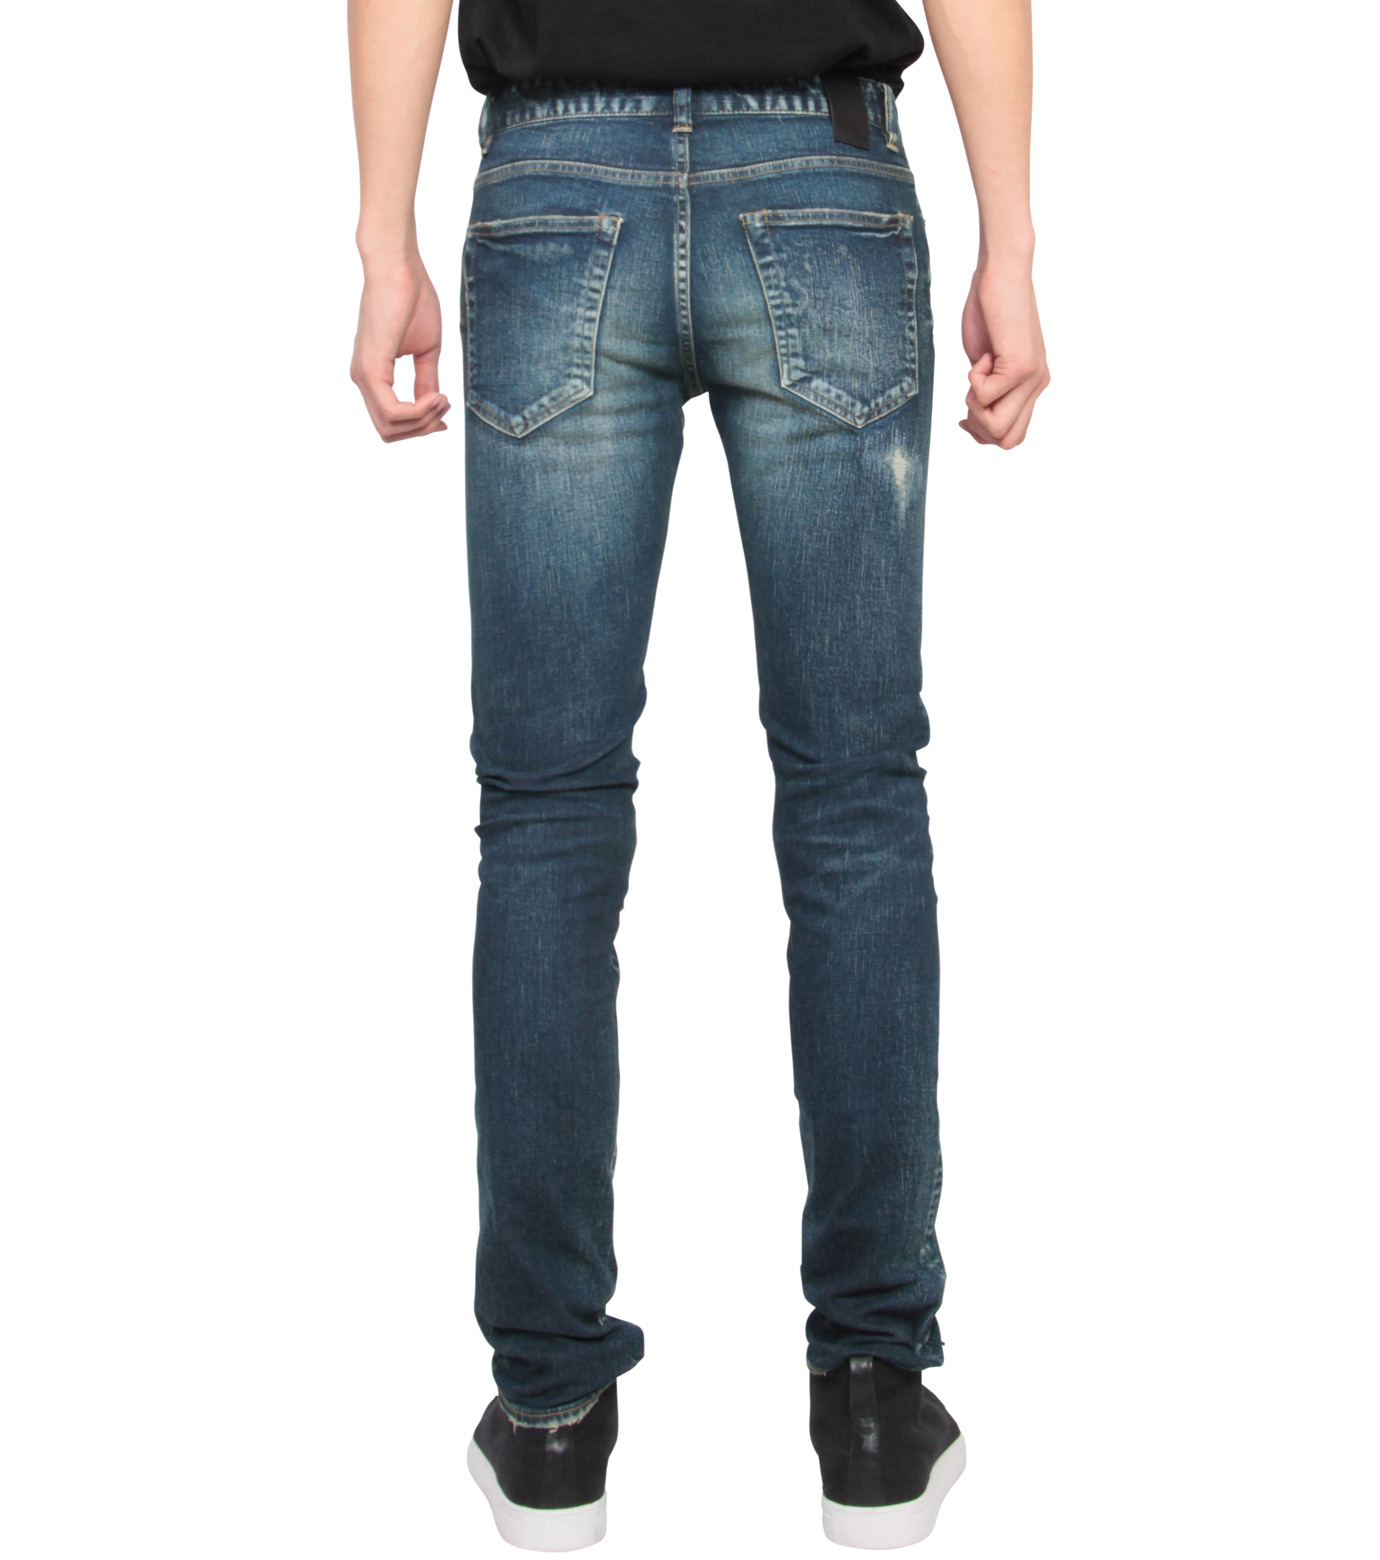 HL HEDDIE LOVU(エイチエル・エディールーヴ)のHL skinDamage-INDIGO(パンツ/pants)-HL-skinDamag-94 拡大詳細画像2